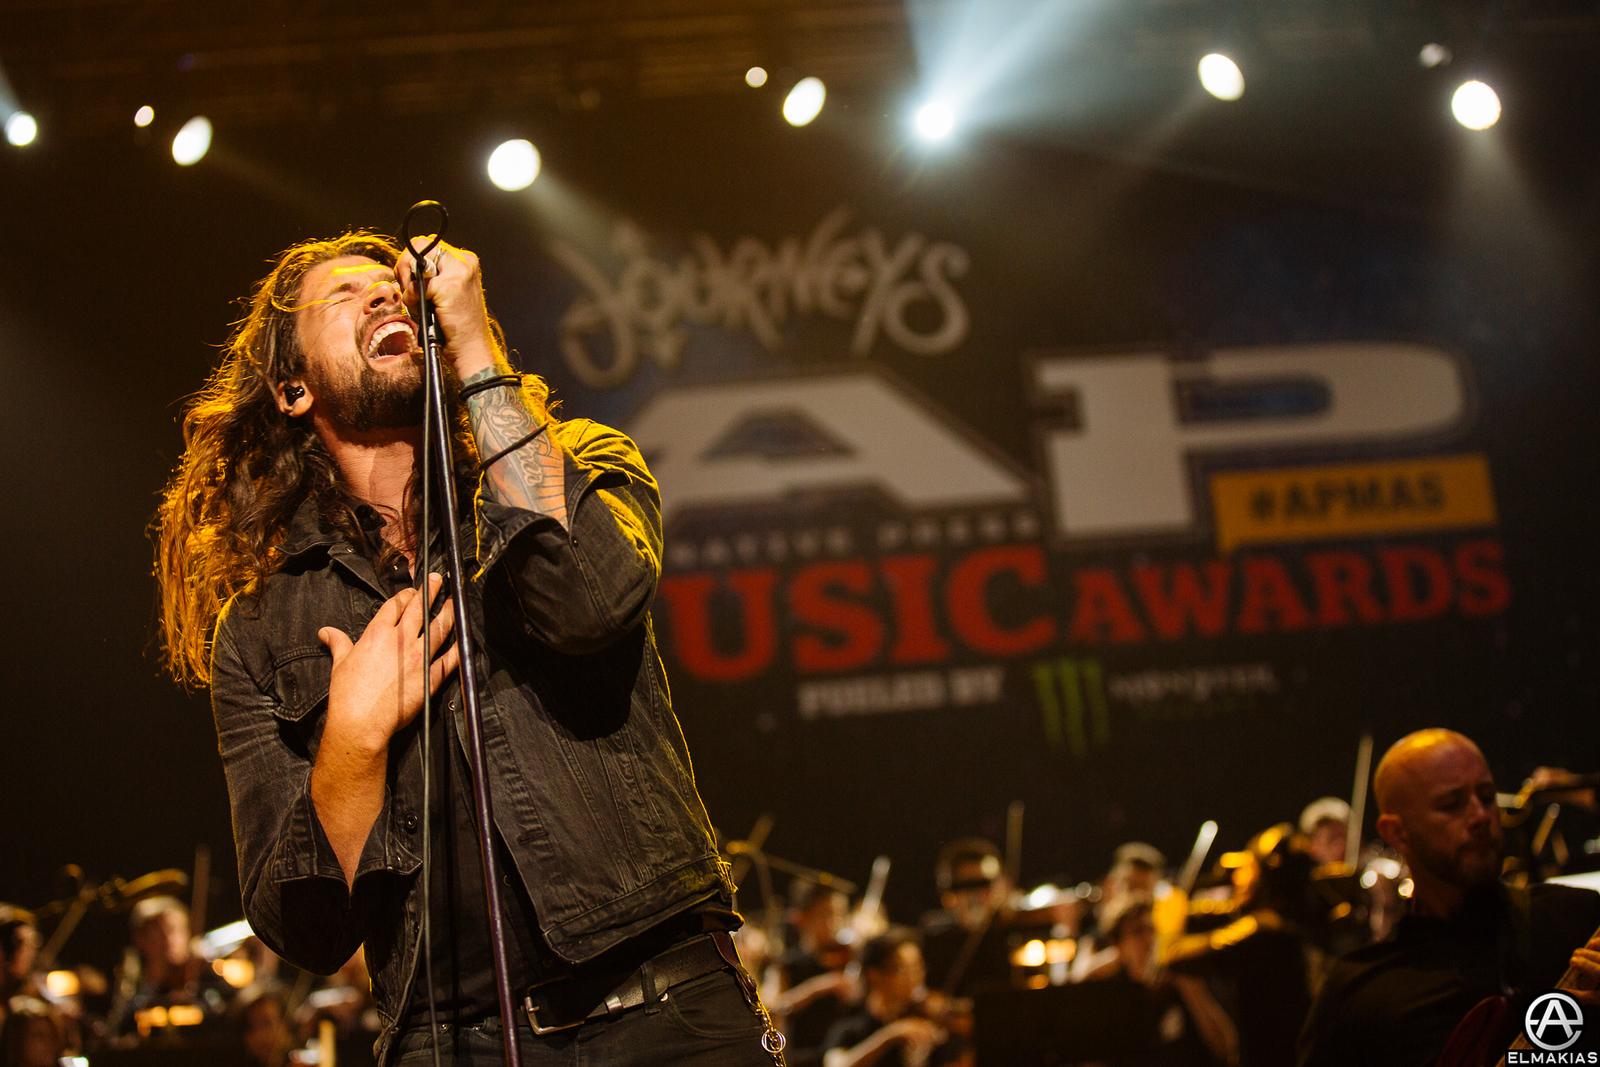 Adam Lazzara of Taking Back Sunday live at the Alternative Press Music Awards 2015 by Adam Elmakias